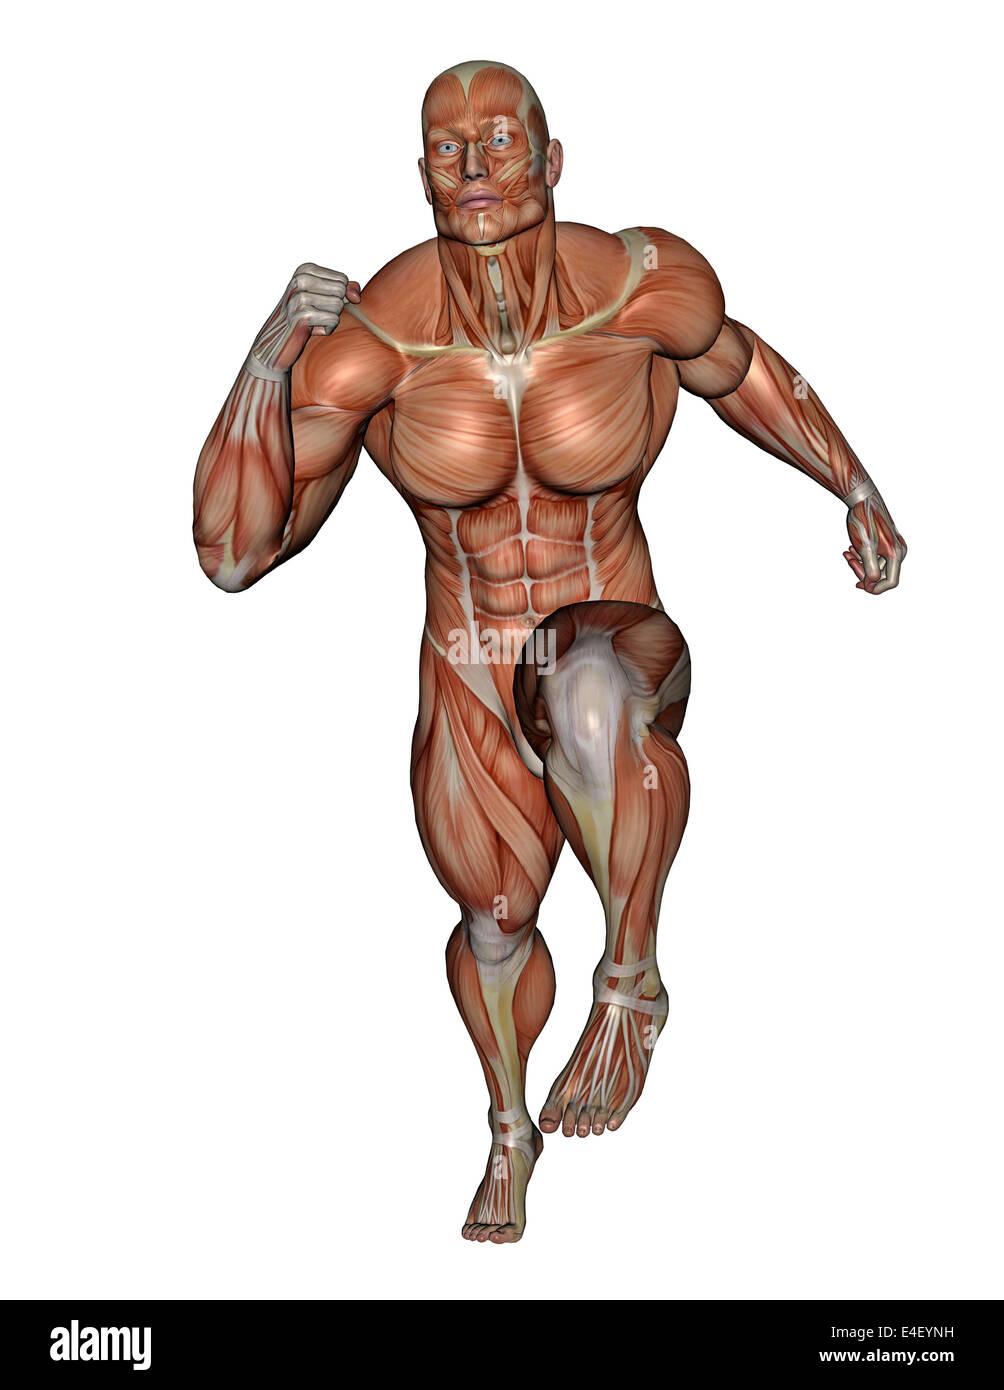 Hombre corriendo muscular, aislado sobre fondo blanco. Imagen De Stock